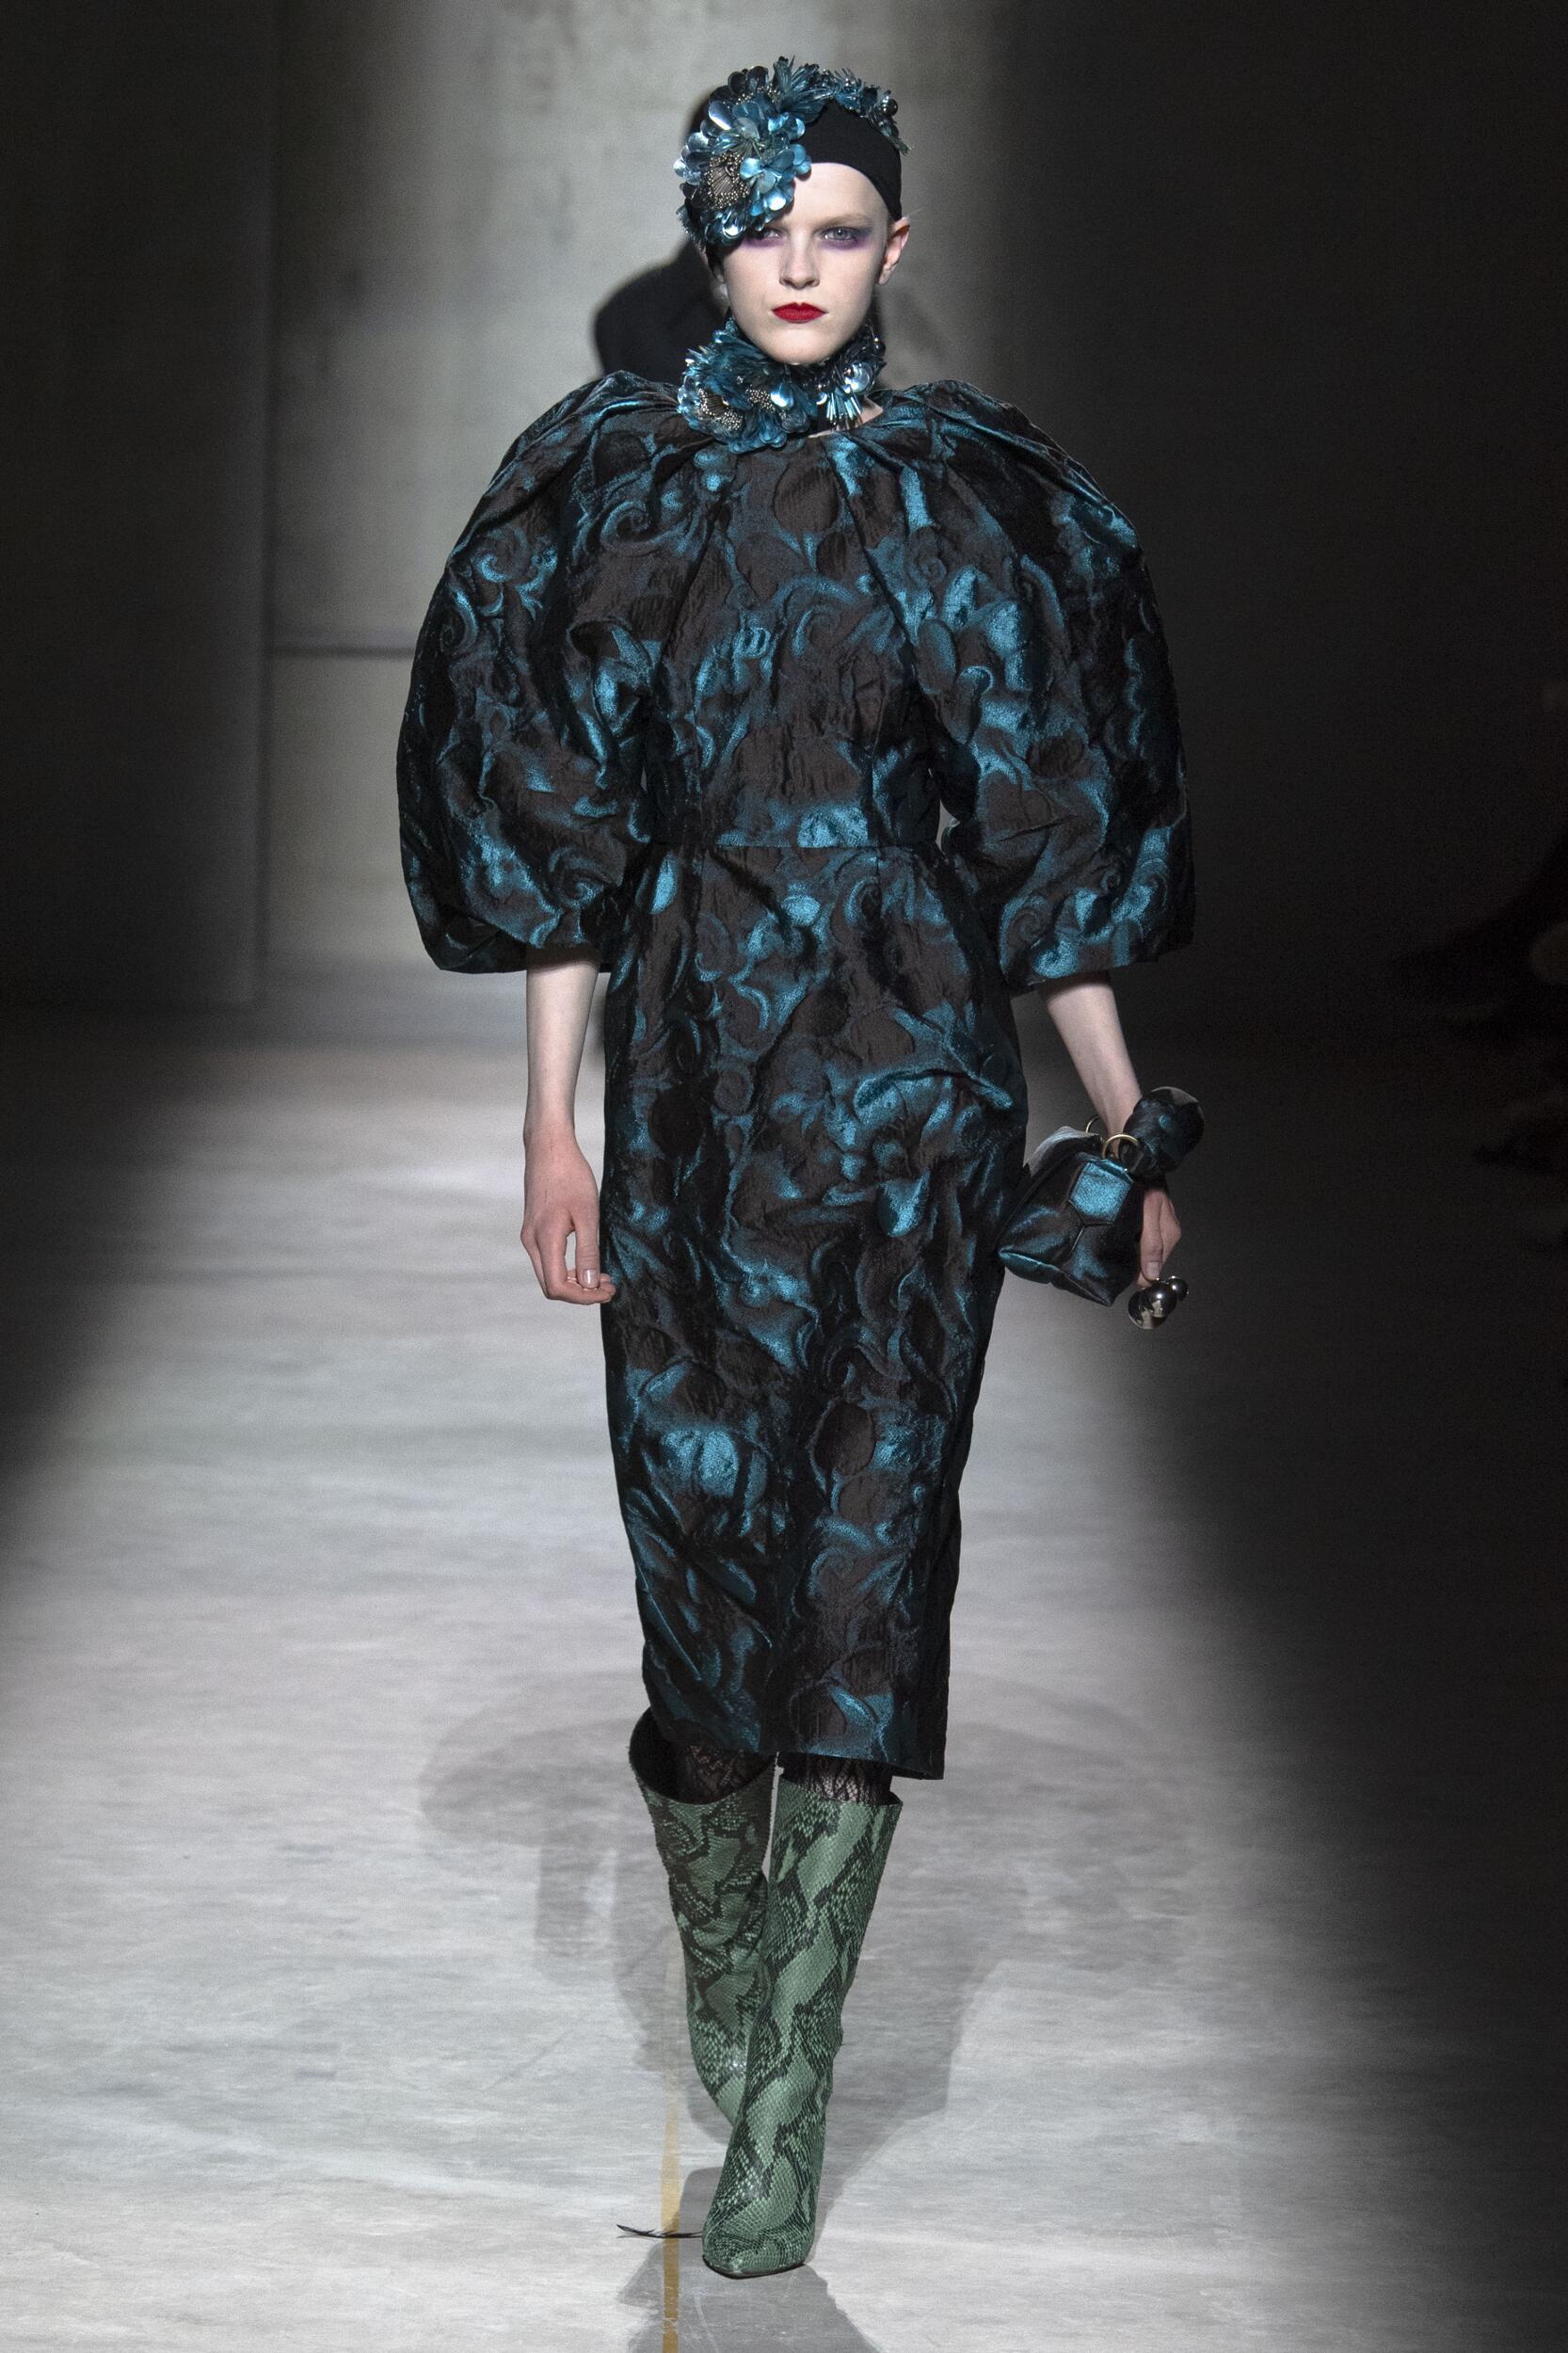 FW 2020 Dries Van Noten Show Paris Fashion Week